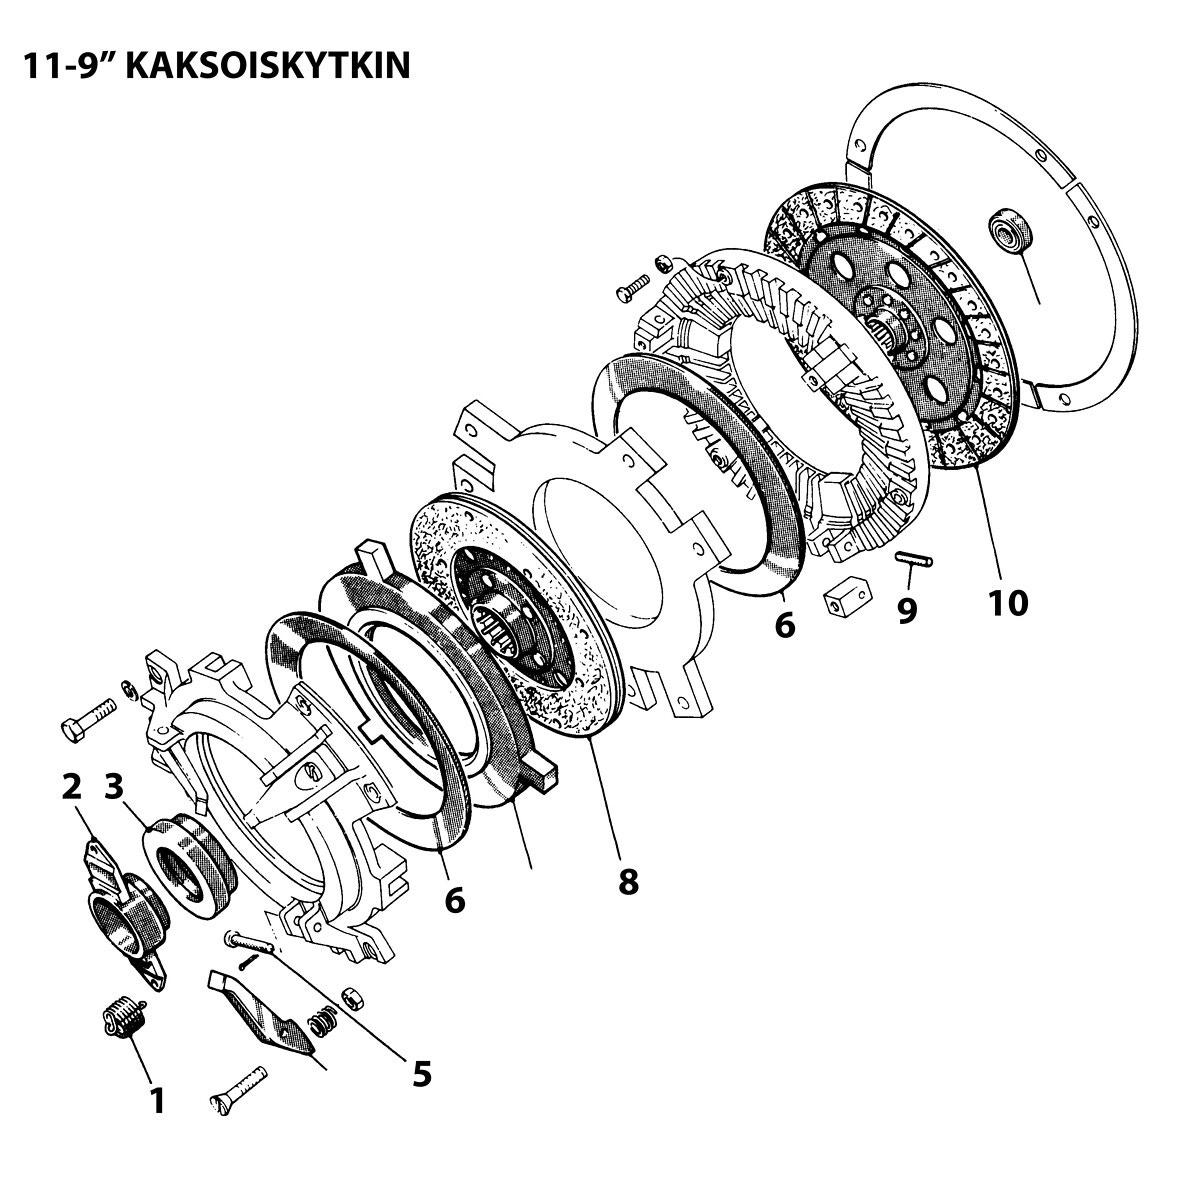 Release Bearing Mf Ford Luk500019940 Ikh Zetor Tractor Wiring Diagram